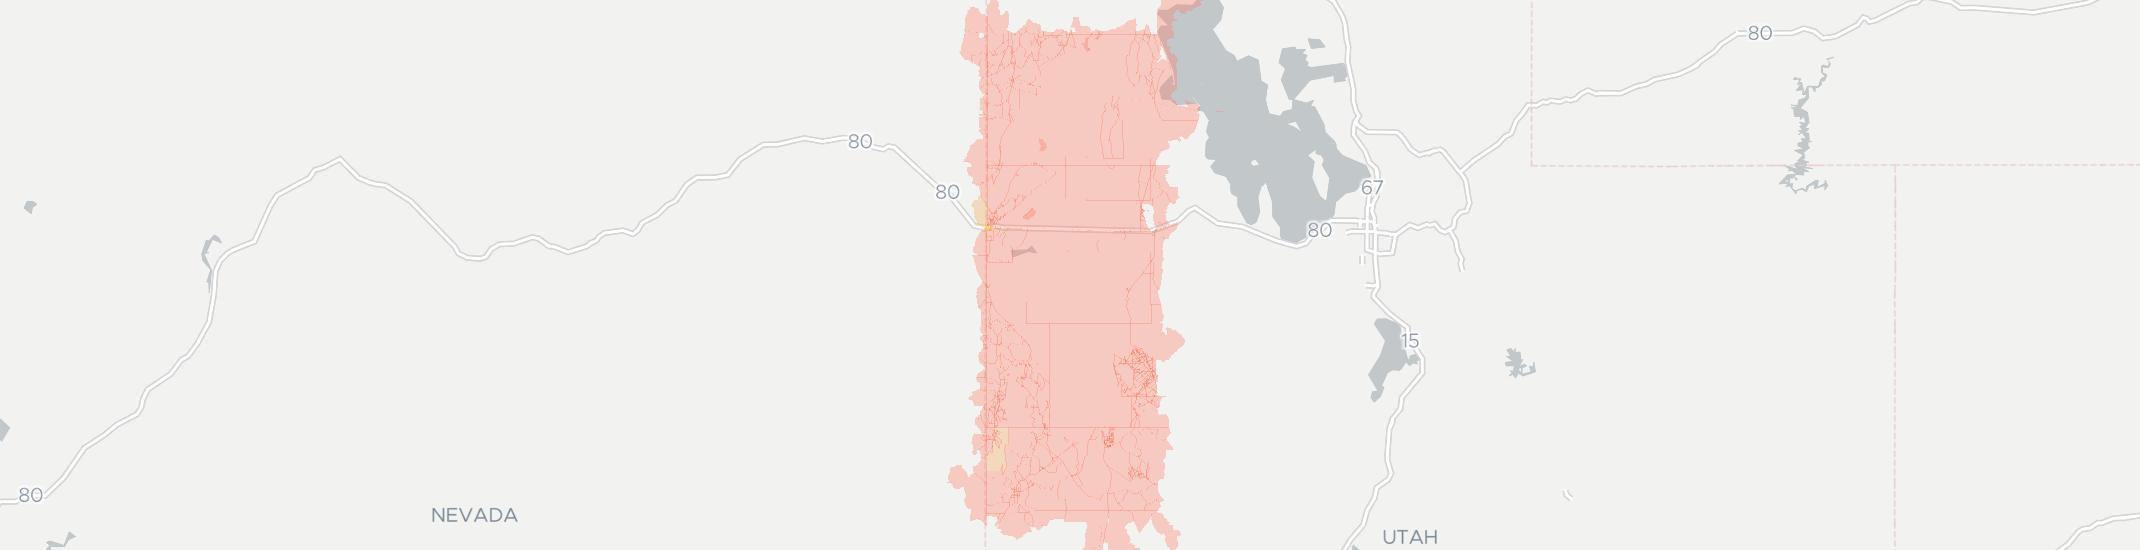 Internet Providers in Wendover, UT: Compare 10 Providers on wells nevada city map, reno nevada city map, elko nevada city map, jackpot nevada city map, utah nevada city map,